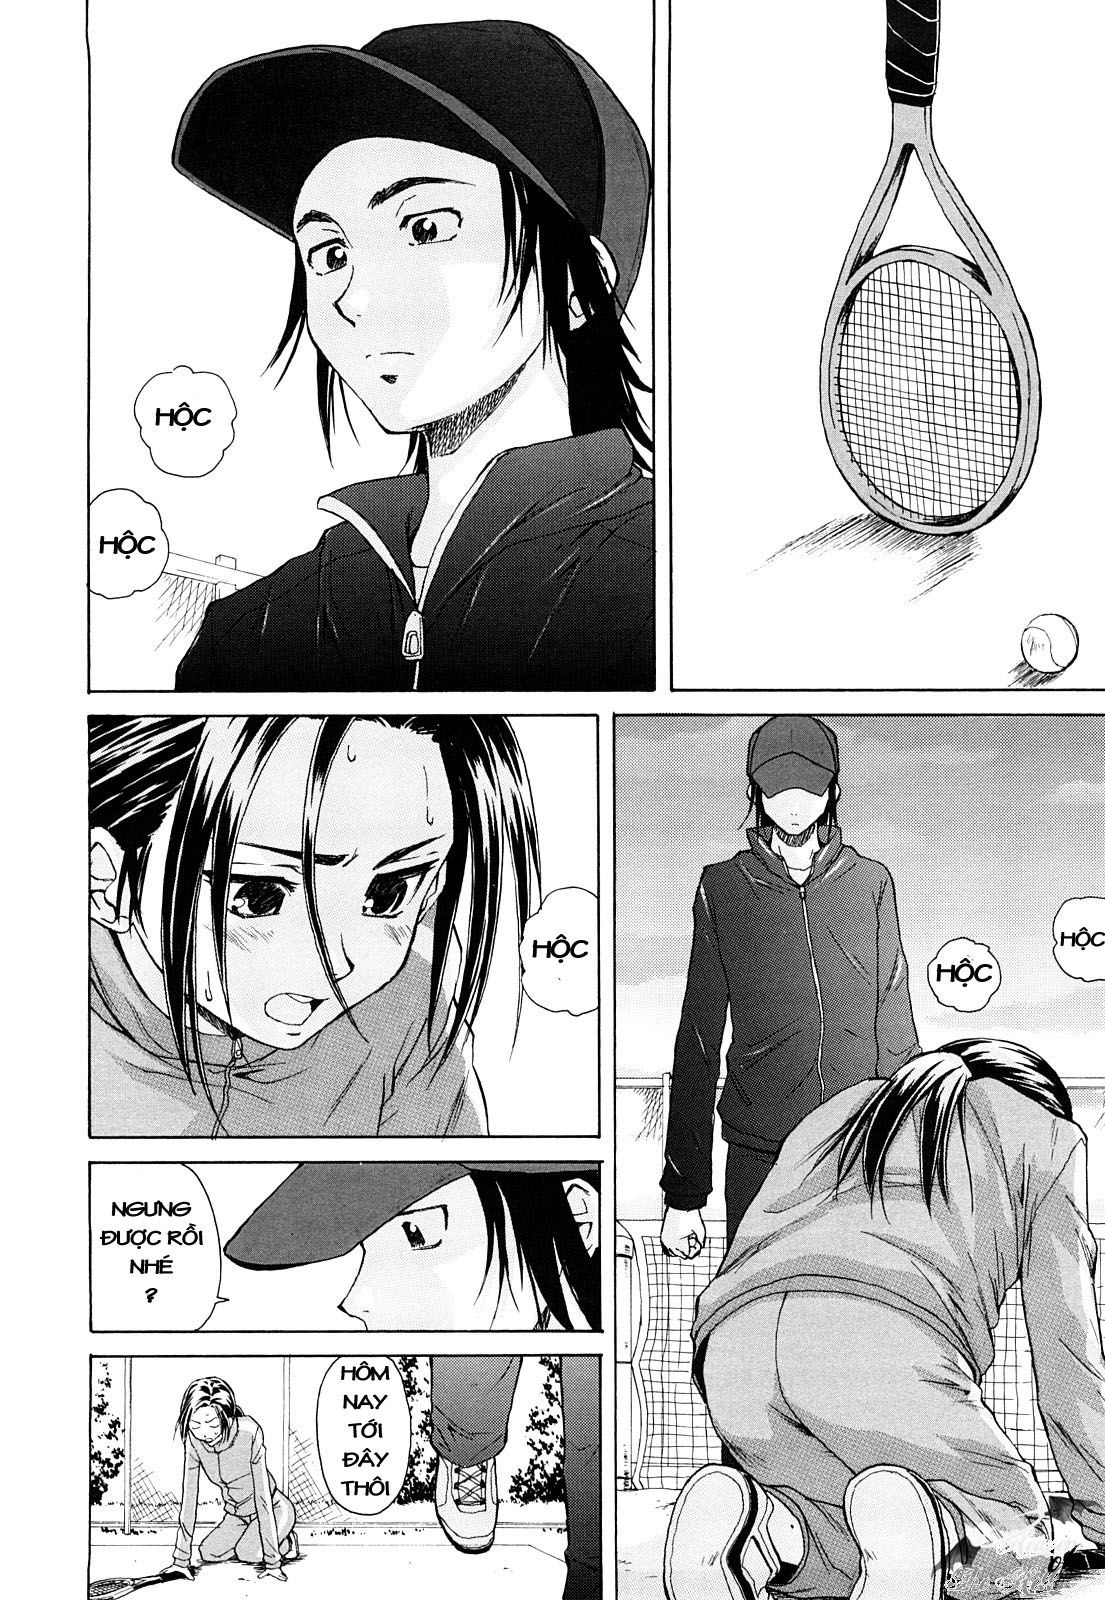 TruyenHay.Com - Ảnh 11 - Setsunai Omoi Chapter 1